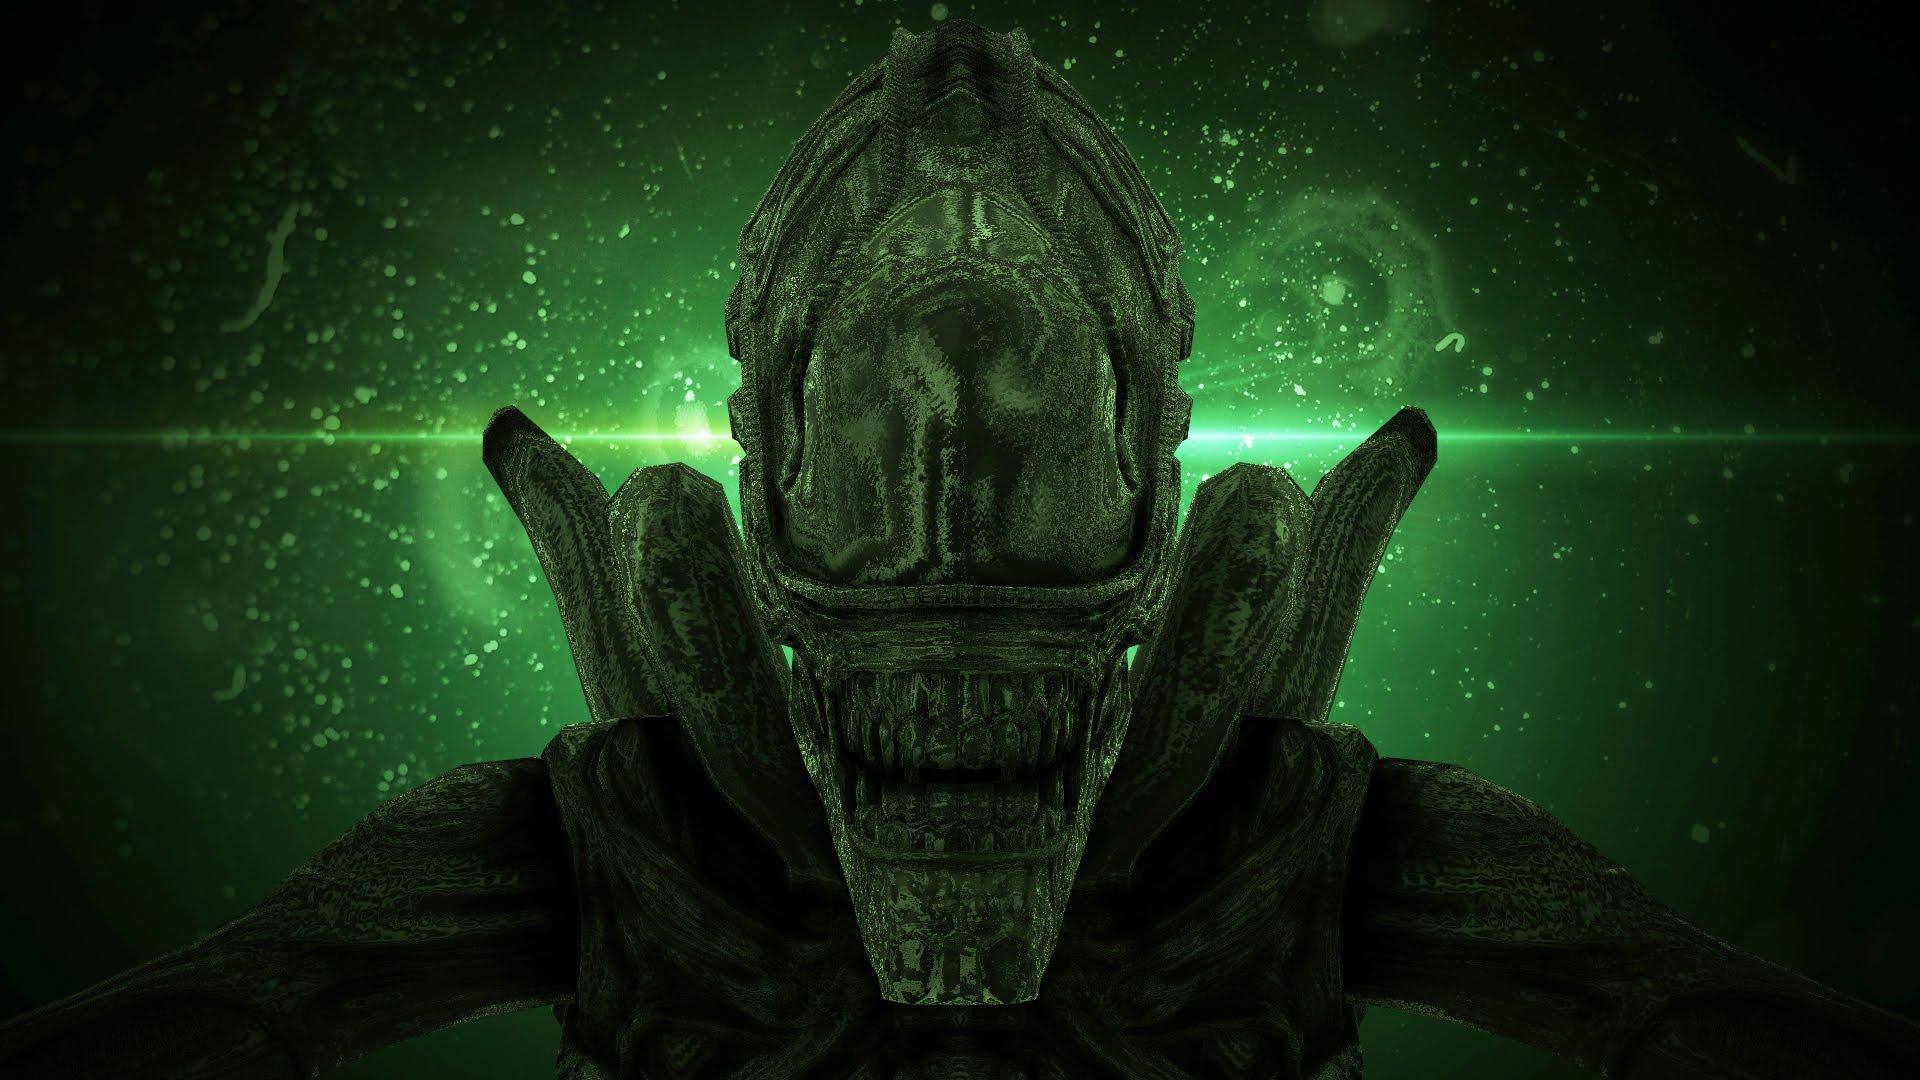 Alien: Covenant Wallpapers